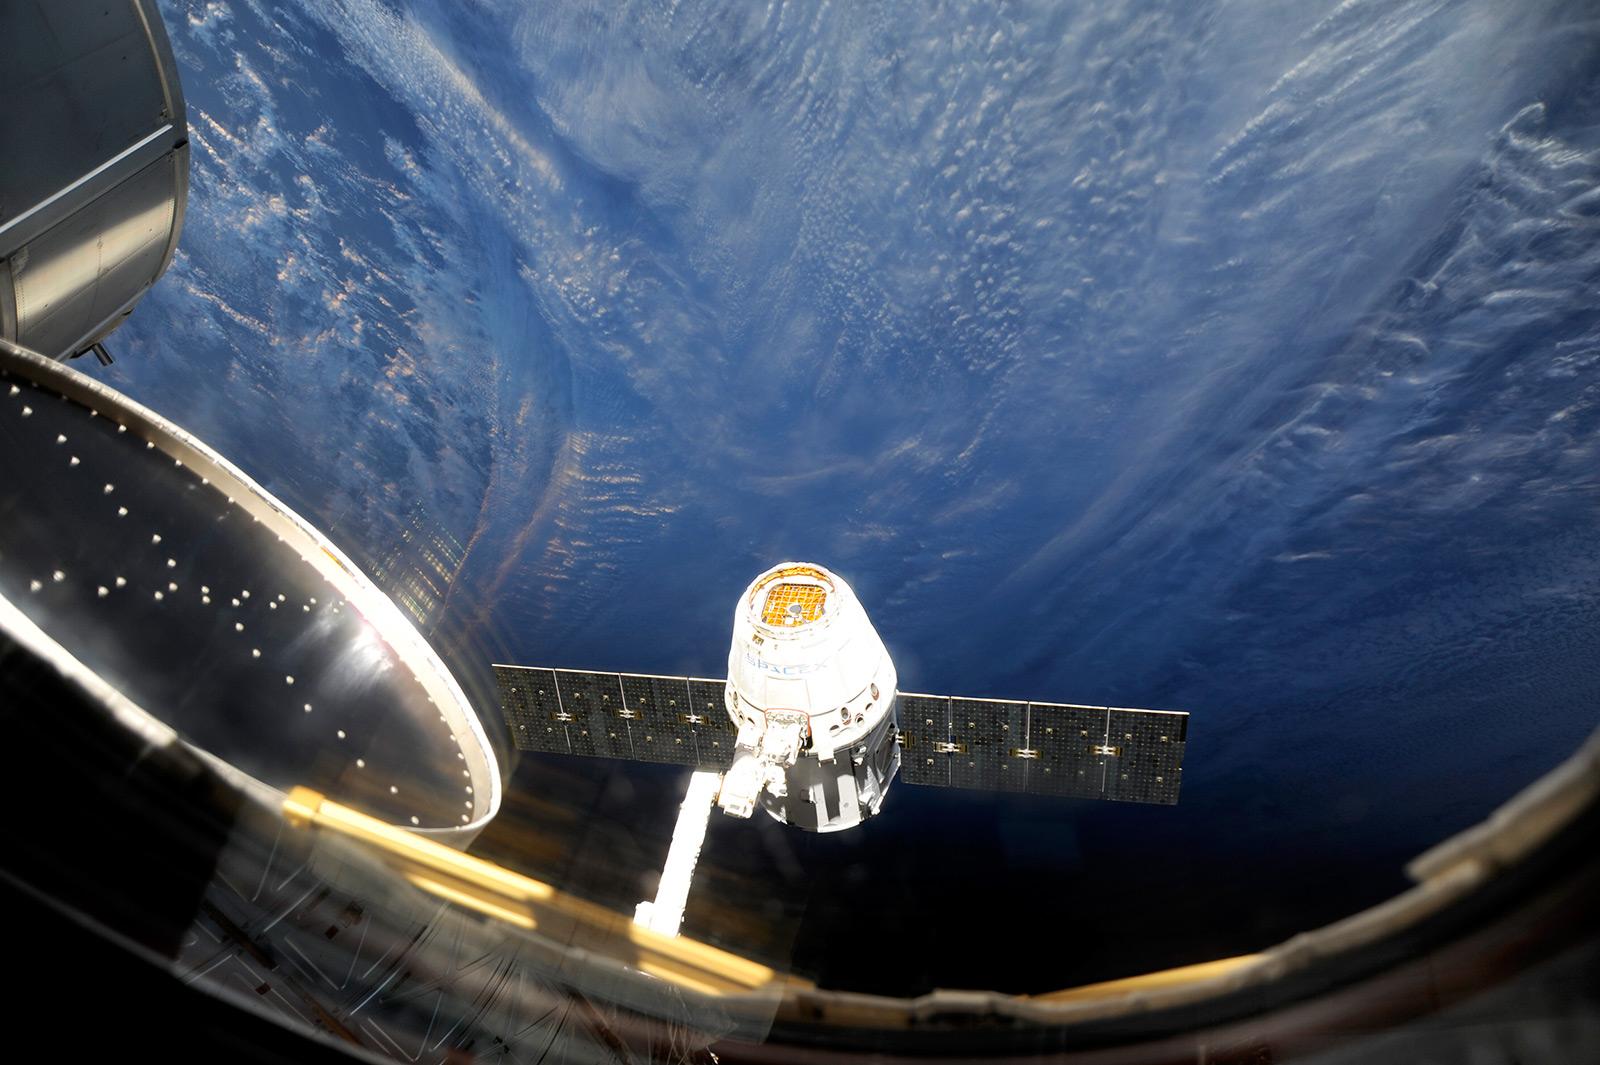 онлайн трансляция spacex #10